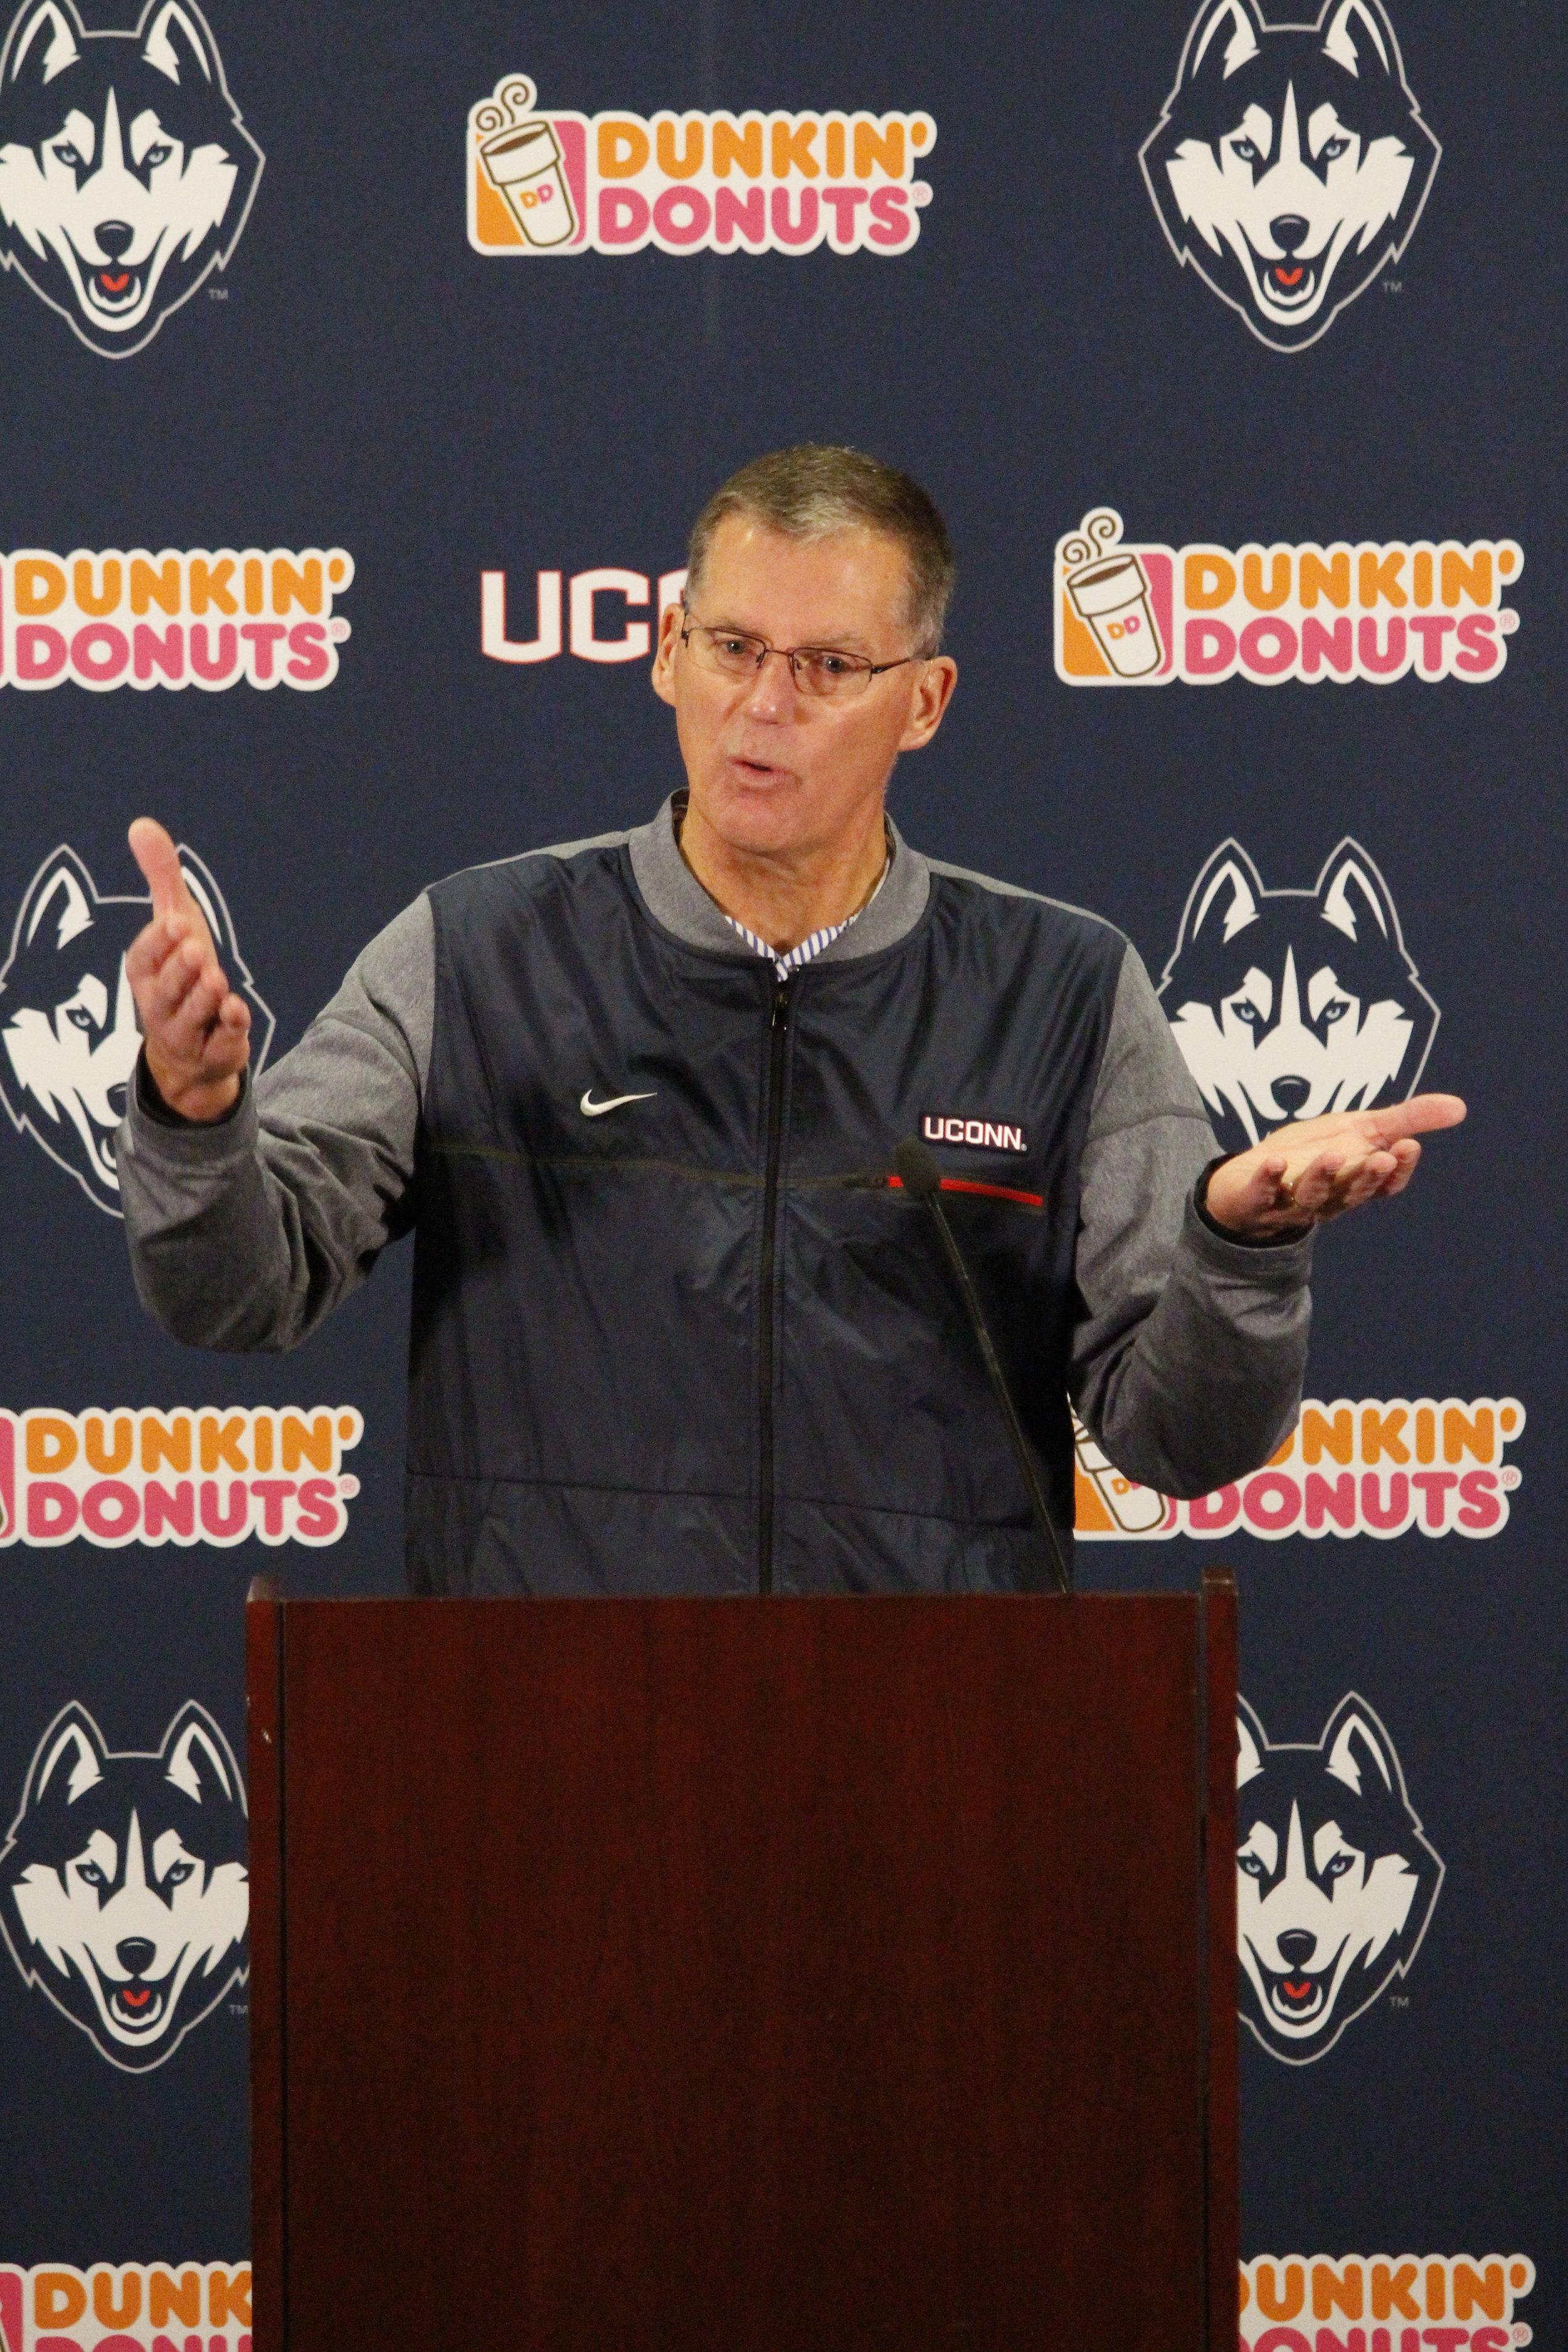 UConn football head coach Randy Edsall discusses balancing football and academics. (Eric Wang/ The Daily Campus)